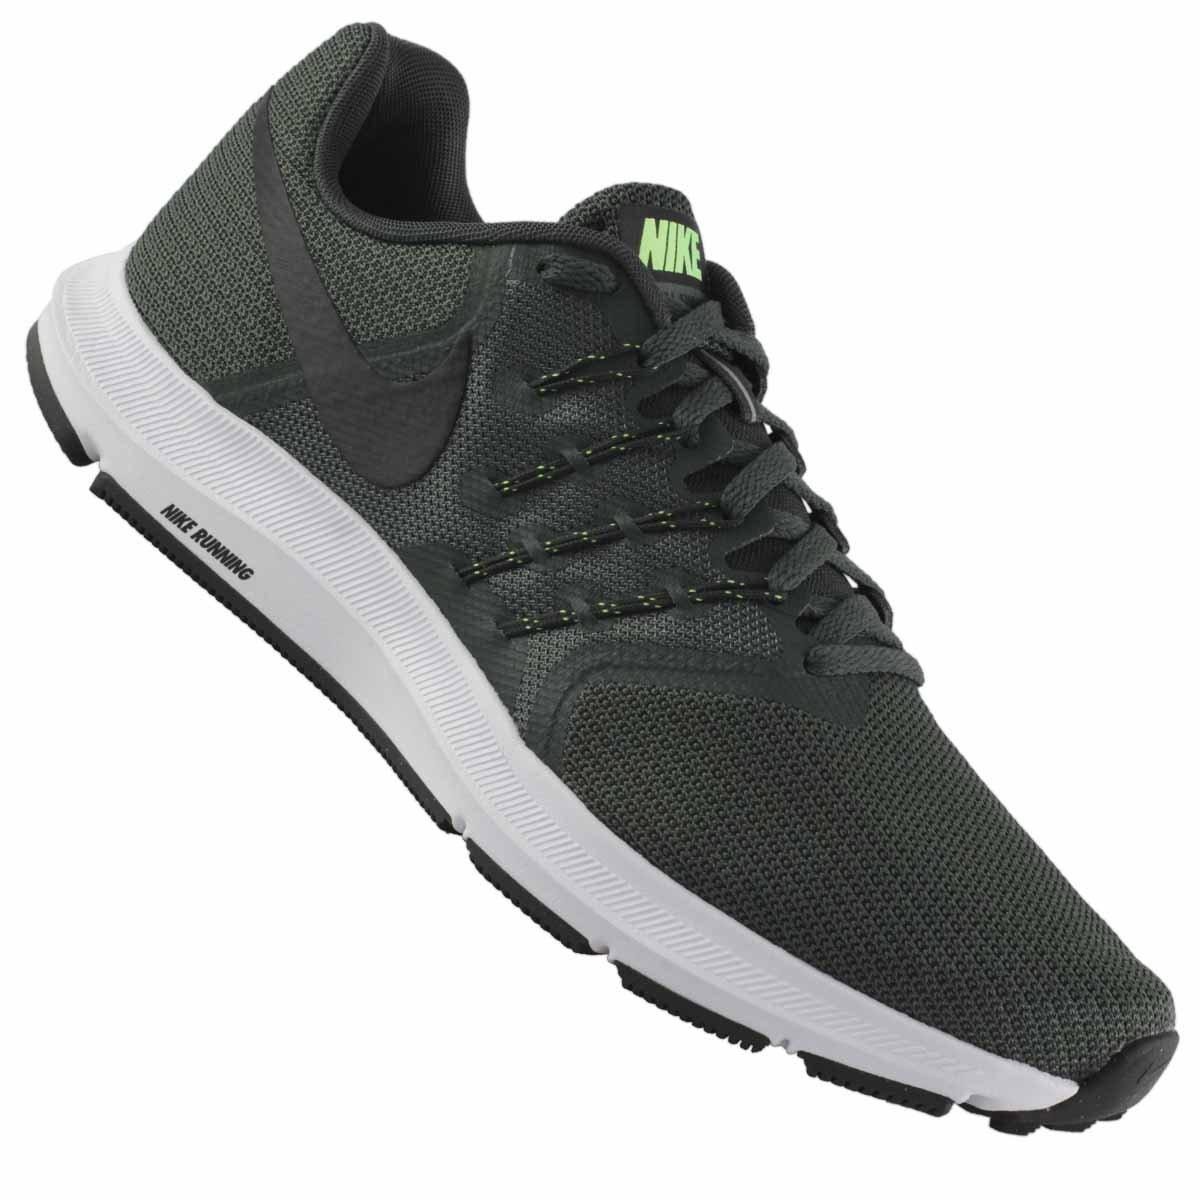 03b638acfa3 Tênis Nike Run Swift